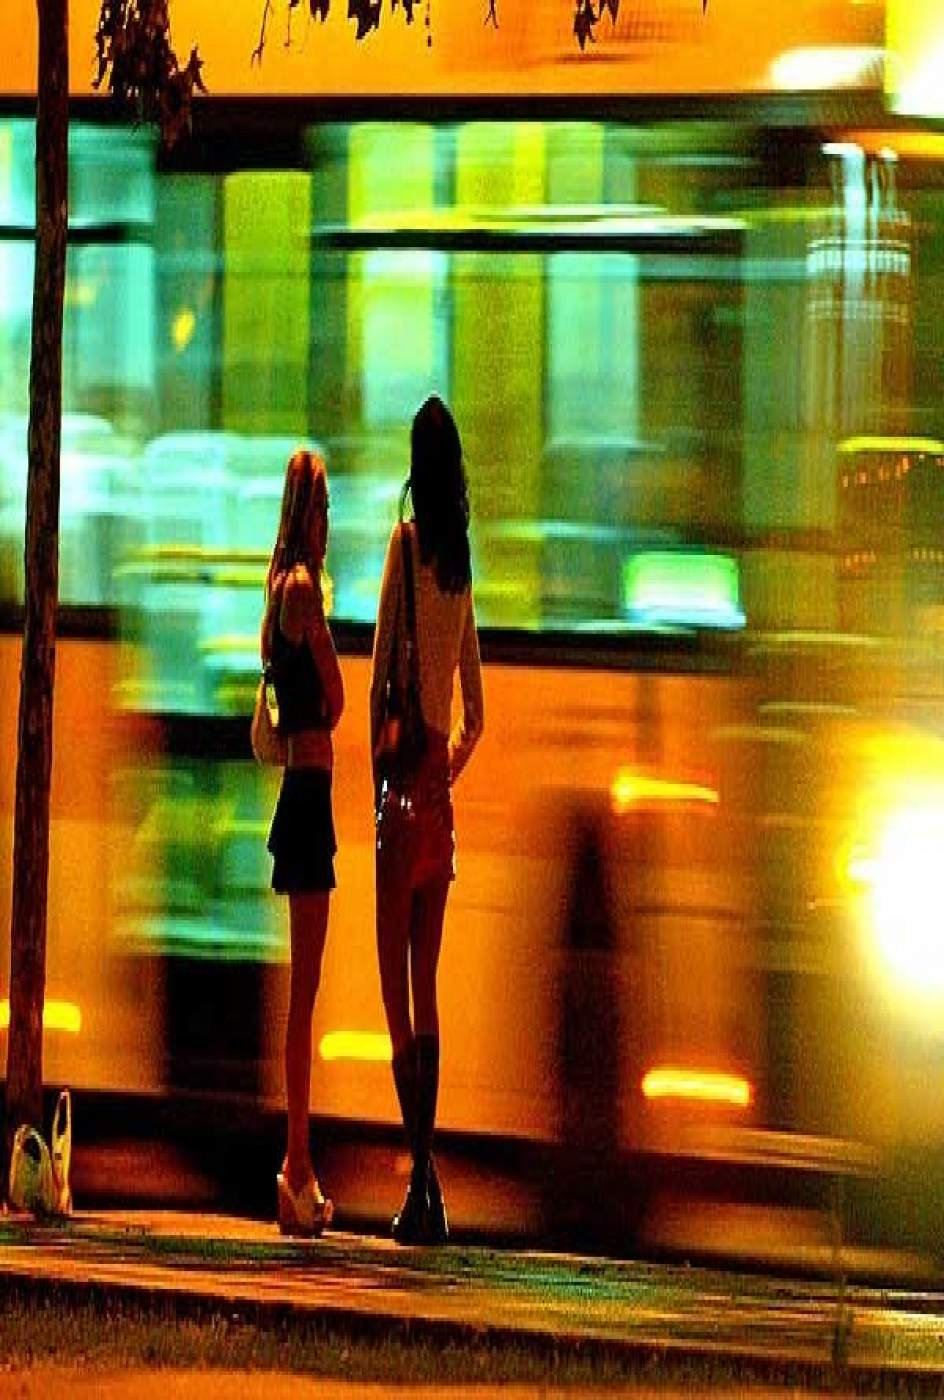 enfermedades prostitutas con preservativo prostitutas en hotel